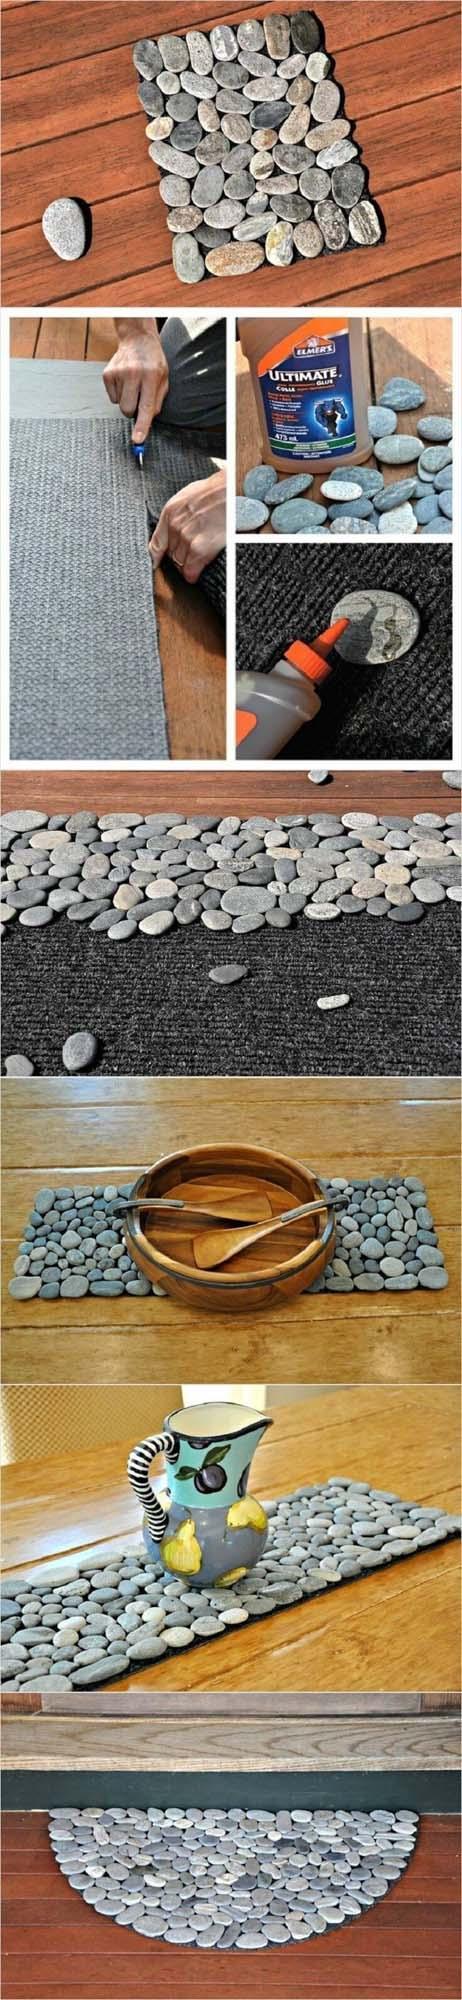 Dress Up Your Welcome Mat #homedecor #pebbles #rocks #decorhomeideas